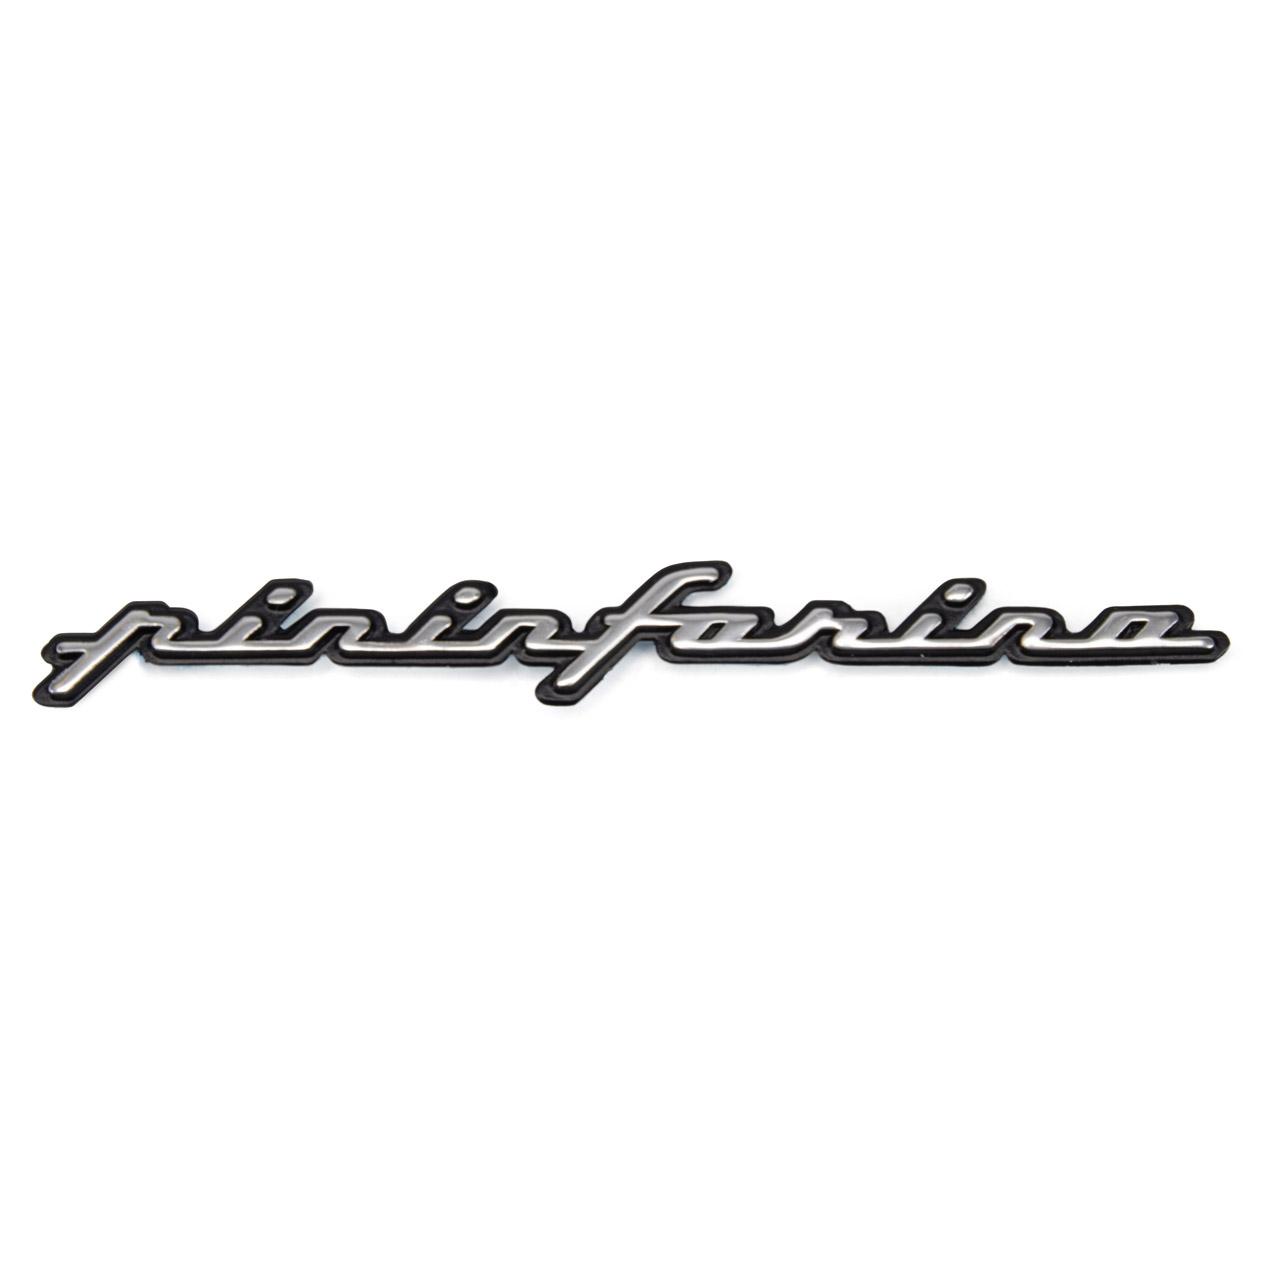 ORIGINAL Alfa Romeo Emblem Schriftzug GTV (916_) SPIDER 60676919 PININFARINA